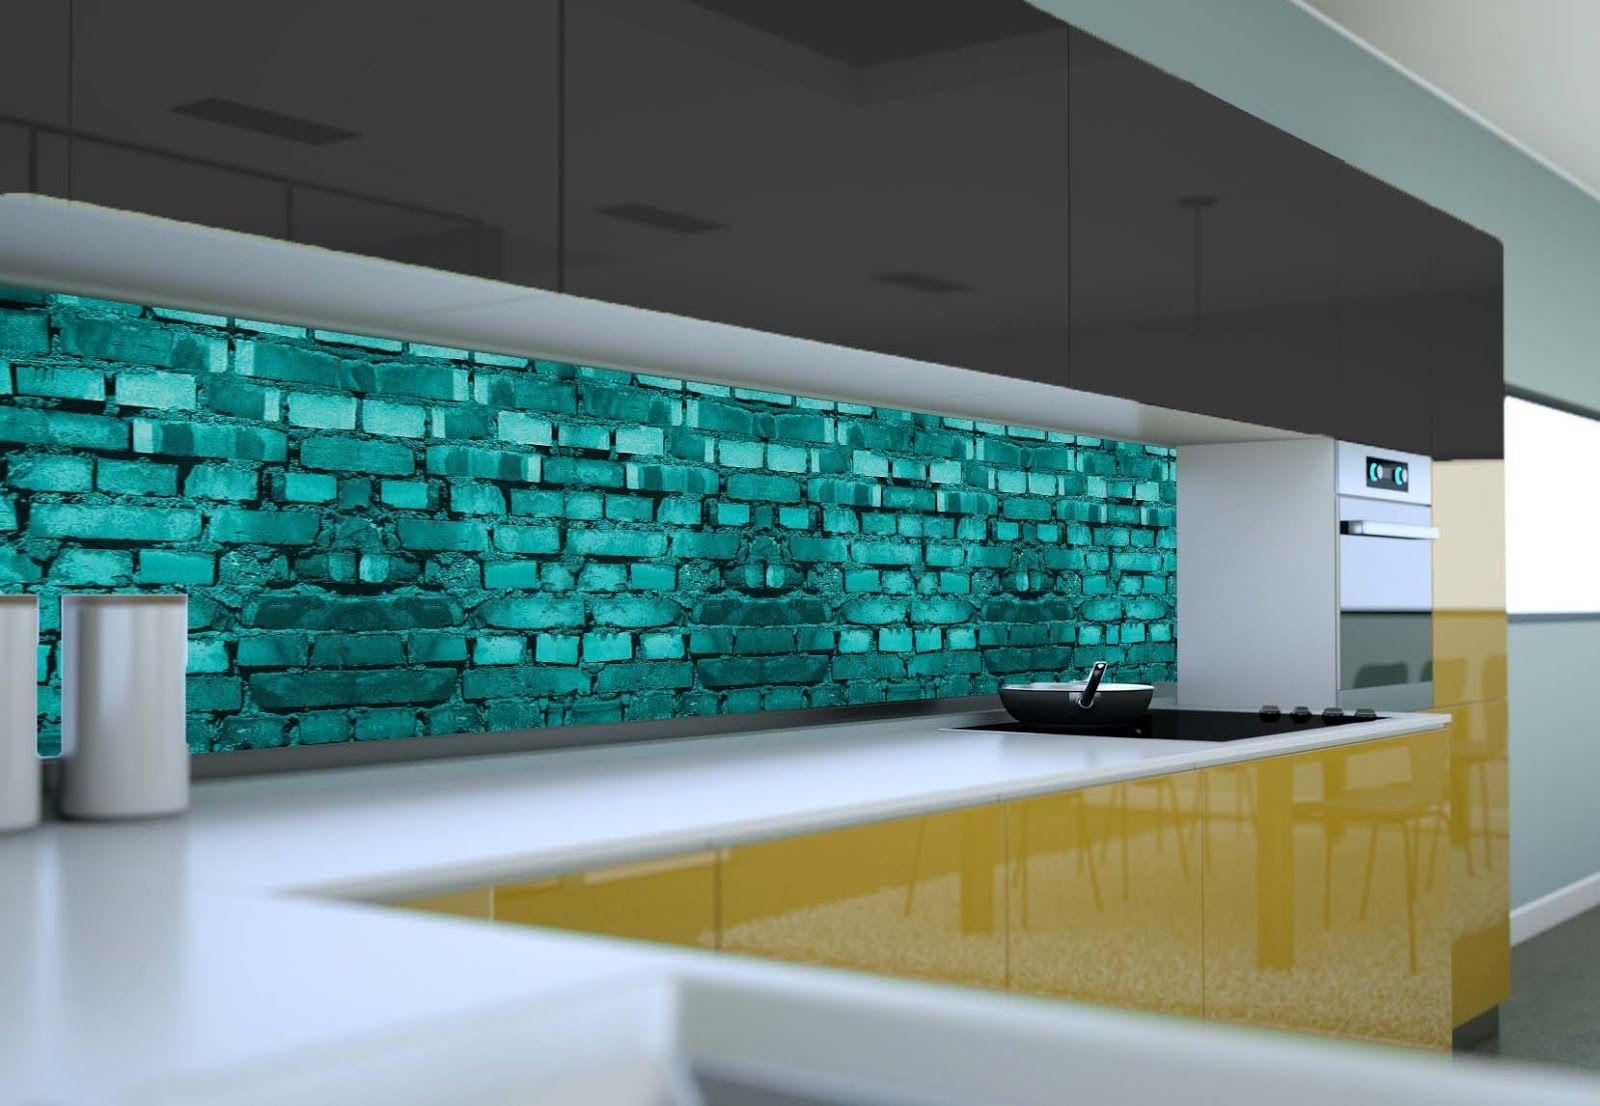 - 3D Kitchen Back Splash Design Ideas With Glass Panels 3D Glass